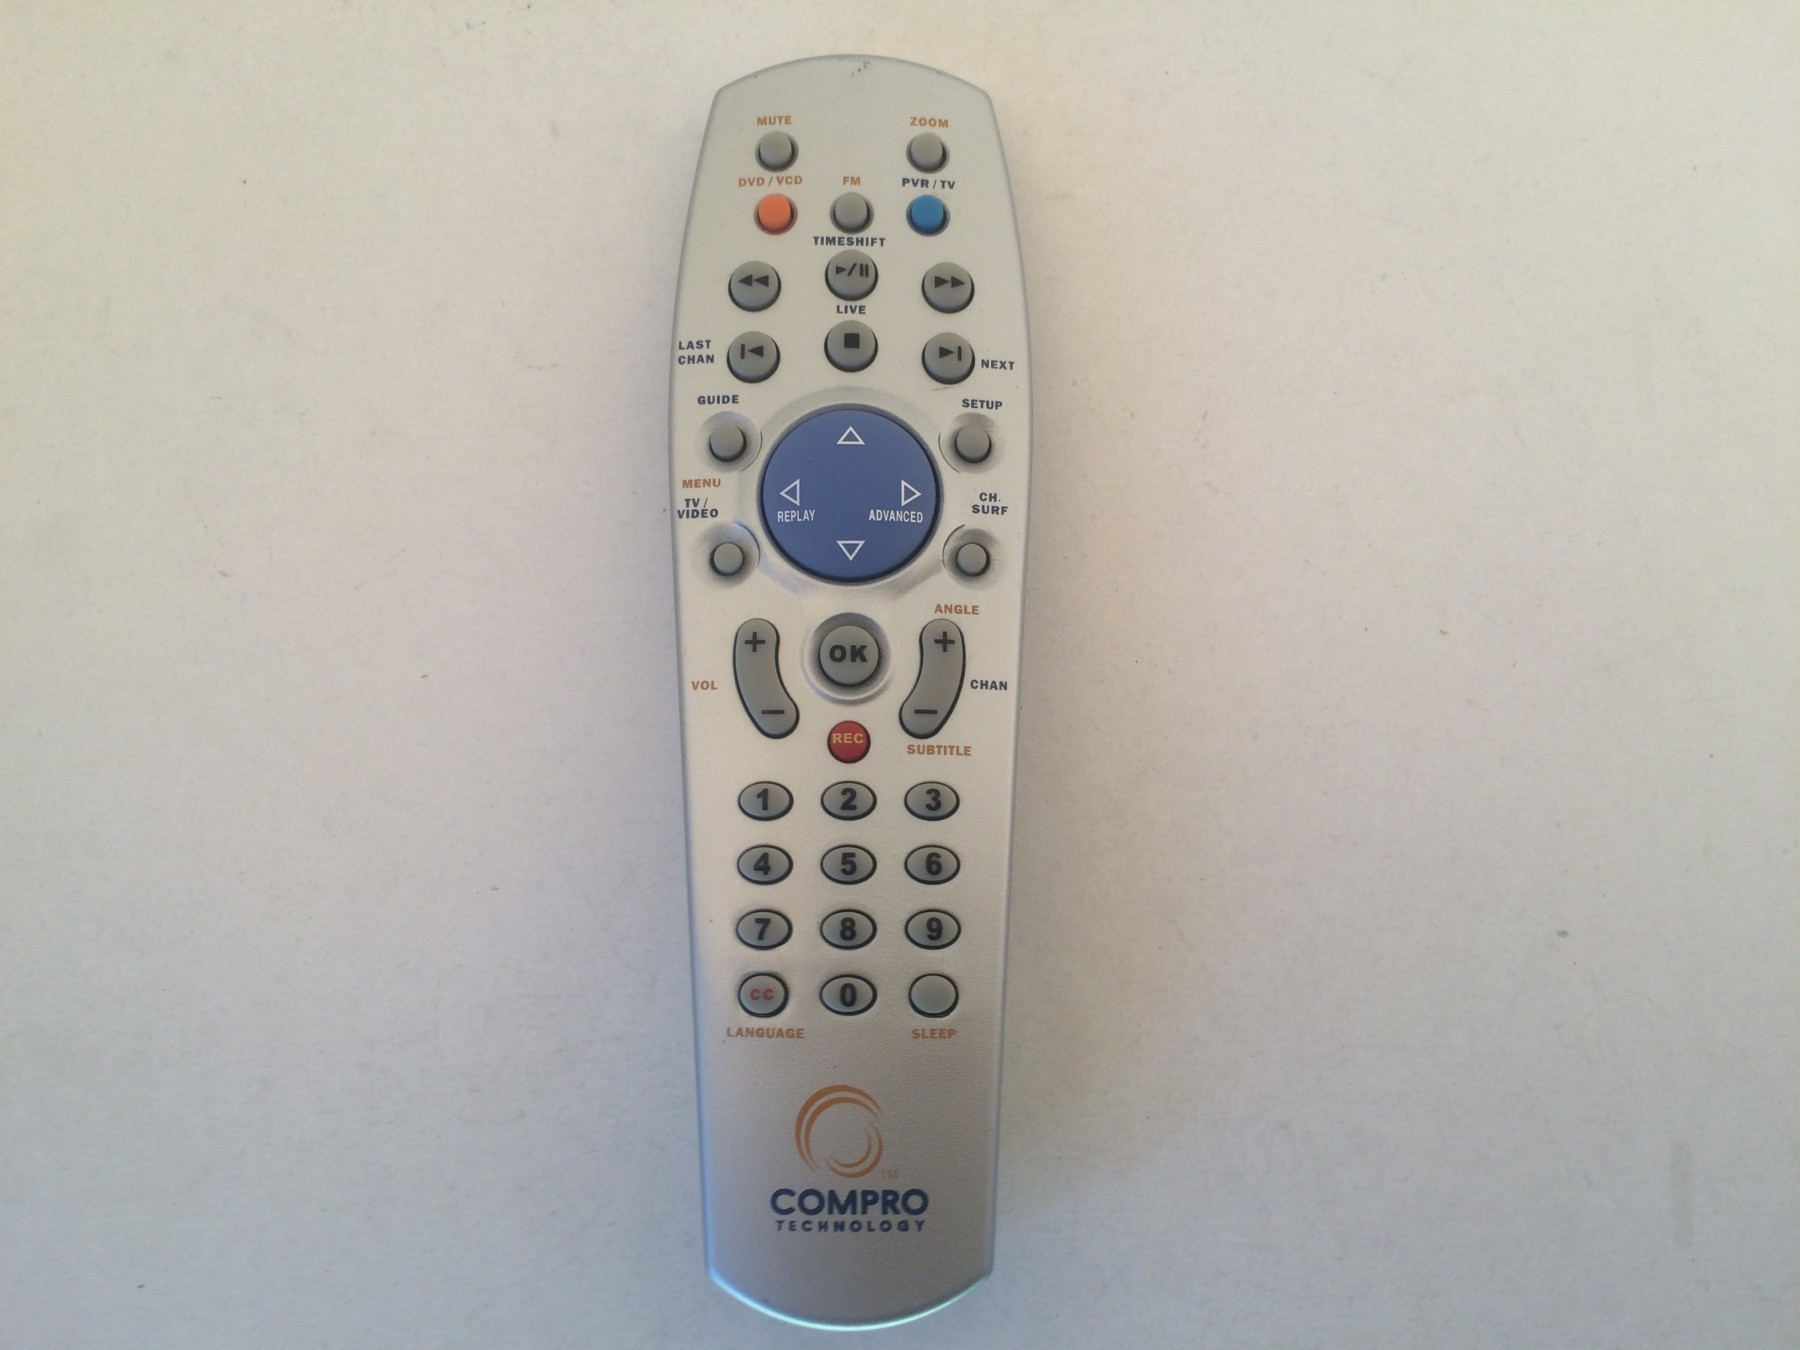 Compro Technology Za TV Kartu GARANCIJA